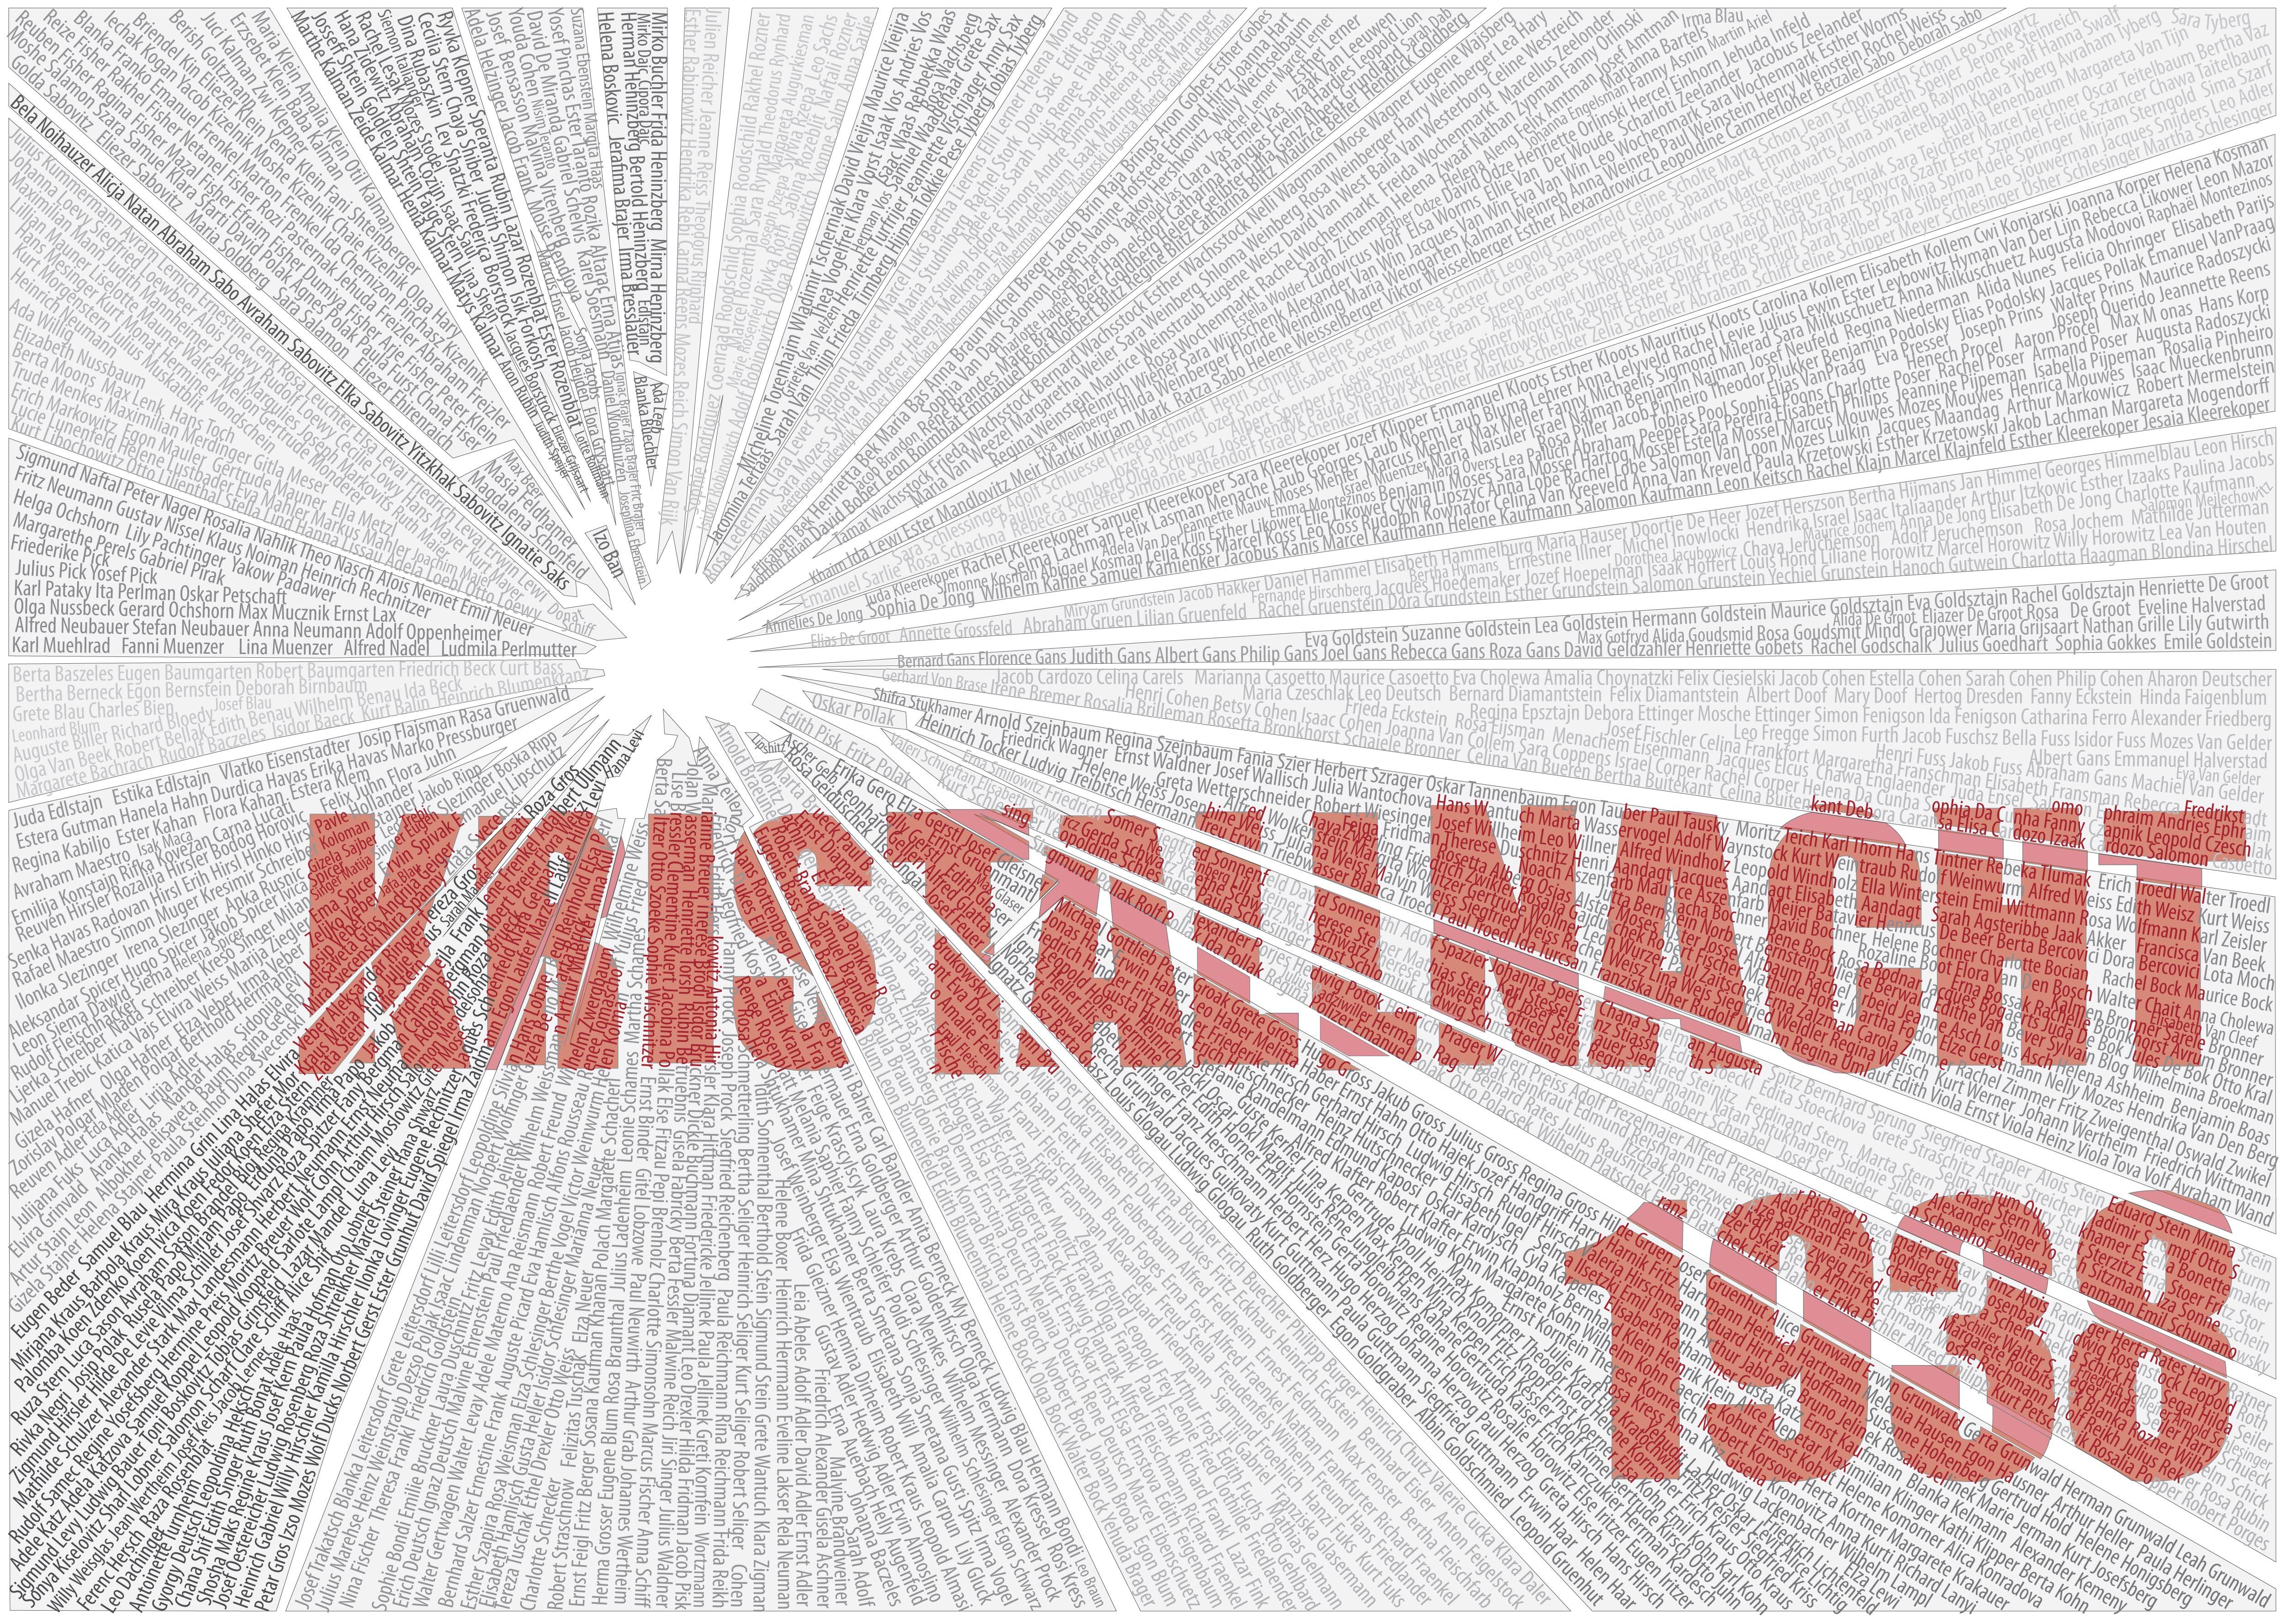 ... df pk 0000252 024 Motto, Kristallnacht.jpg - Wikimedia Commons